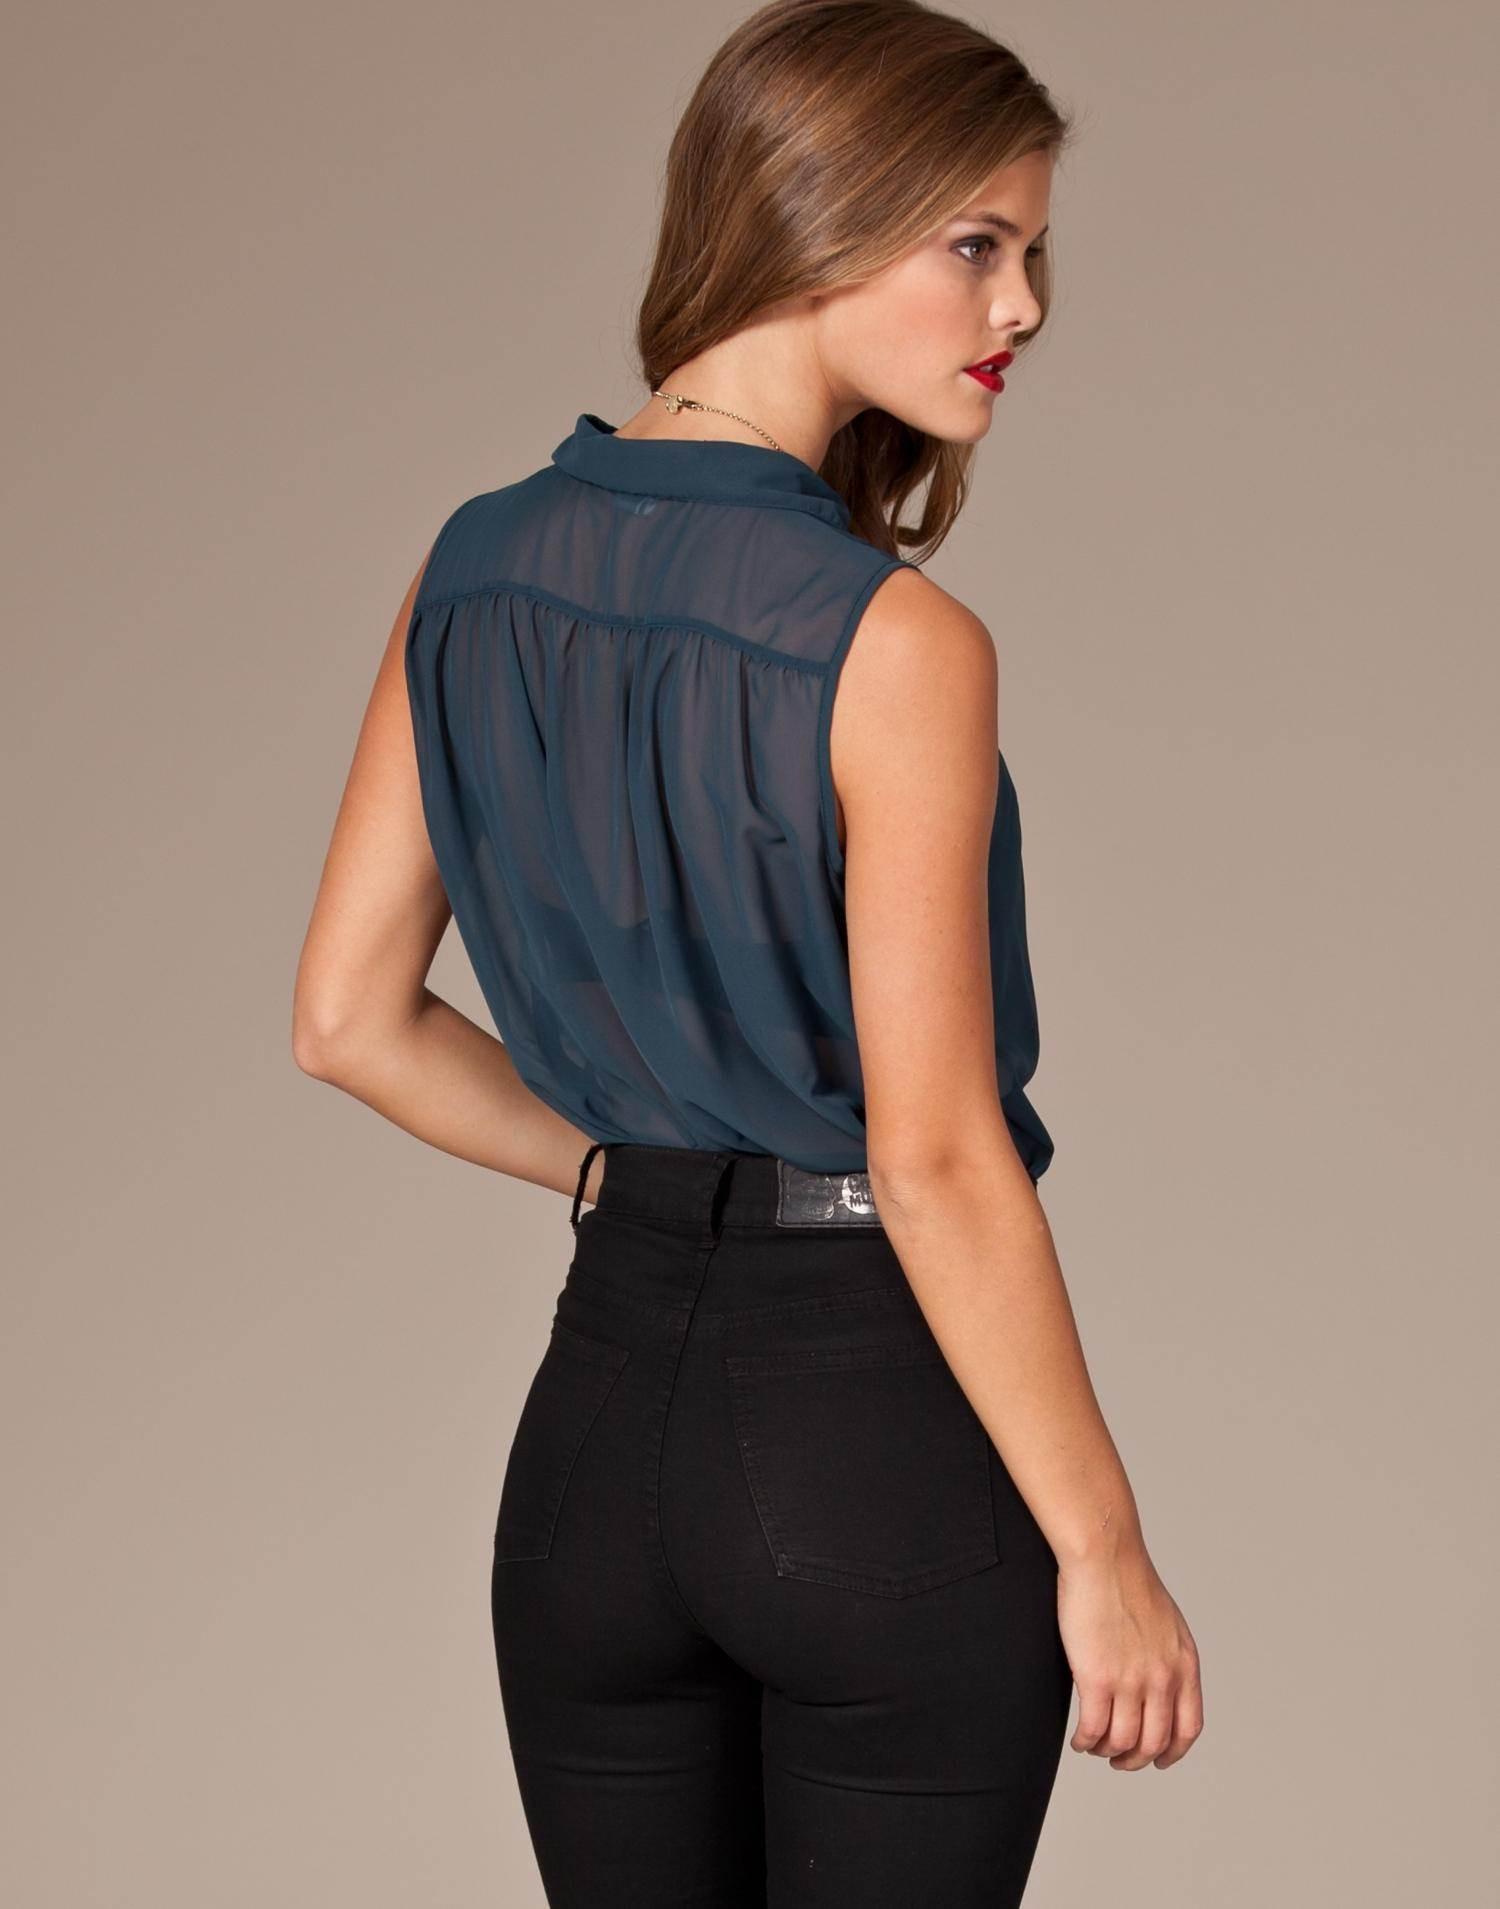 nina agdal nelly 2012 İ231 giyim modelleri İ231 giyim